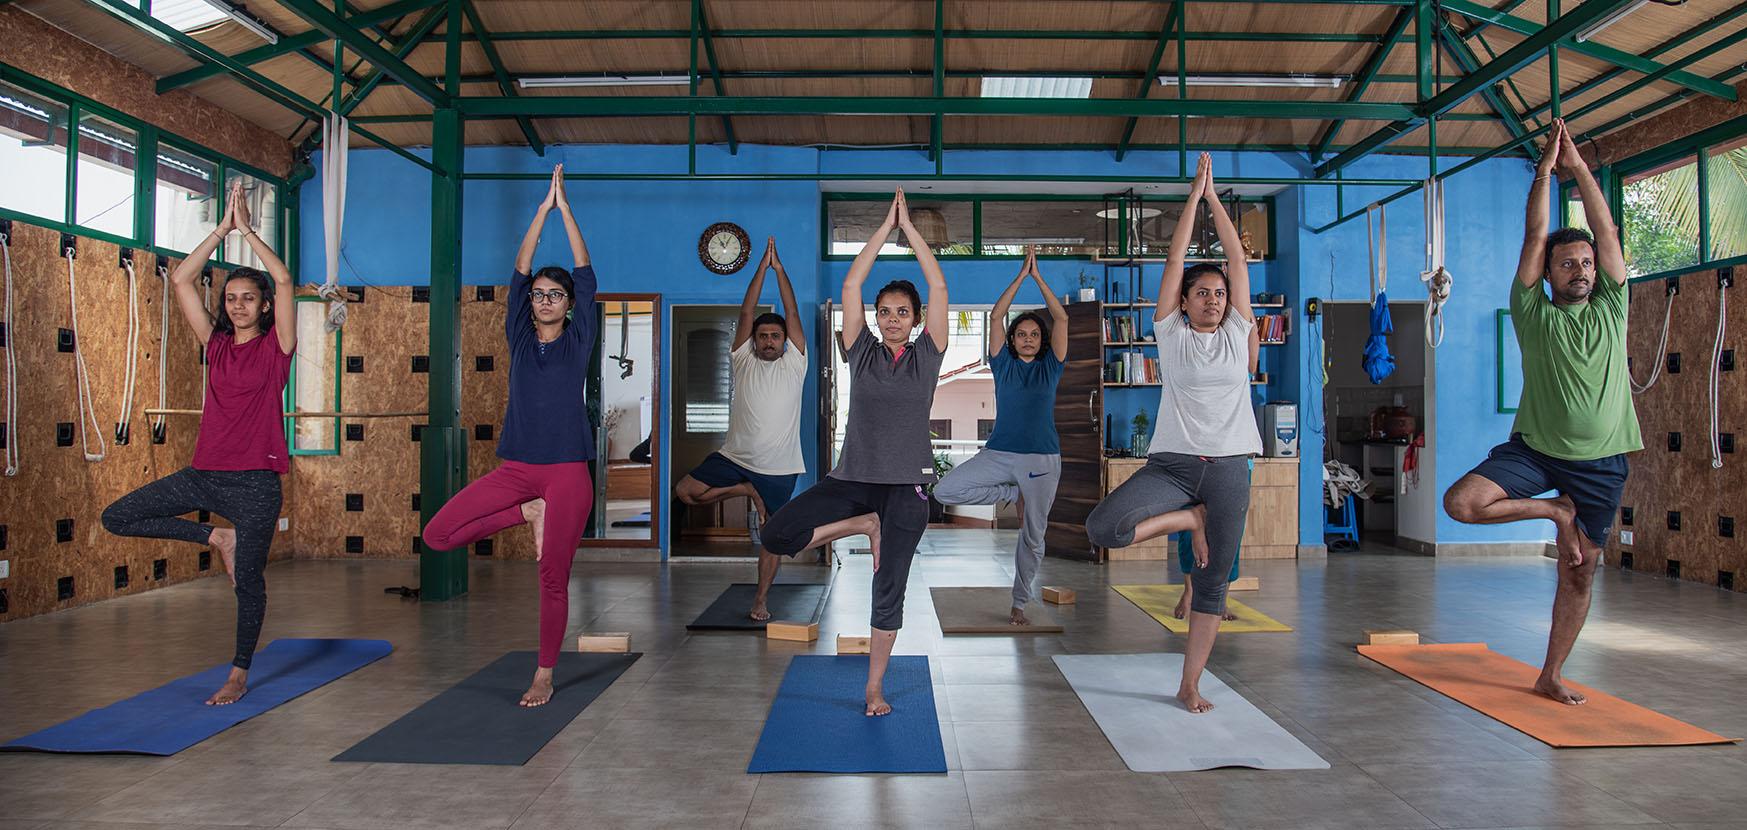 Yoga practice approach